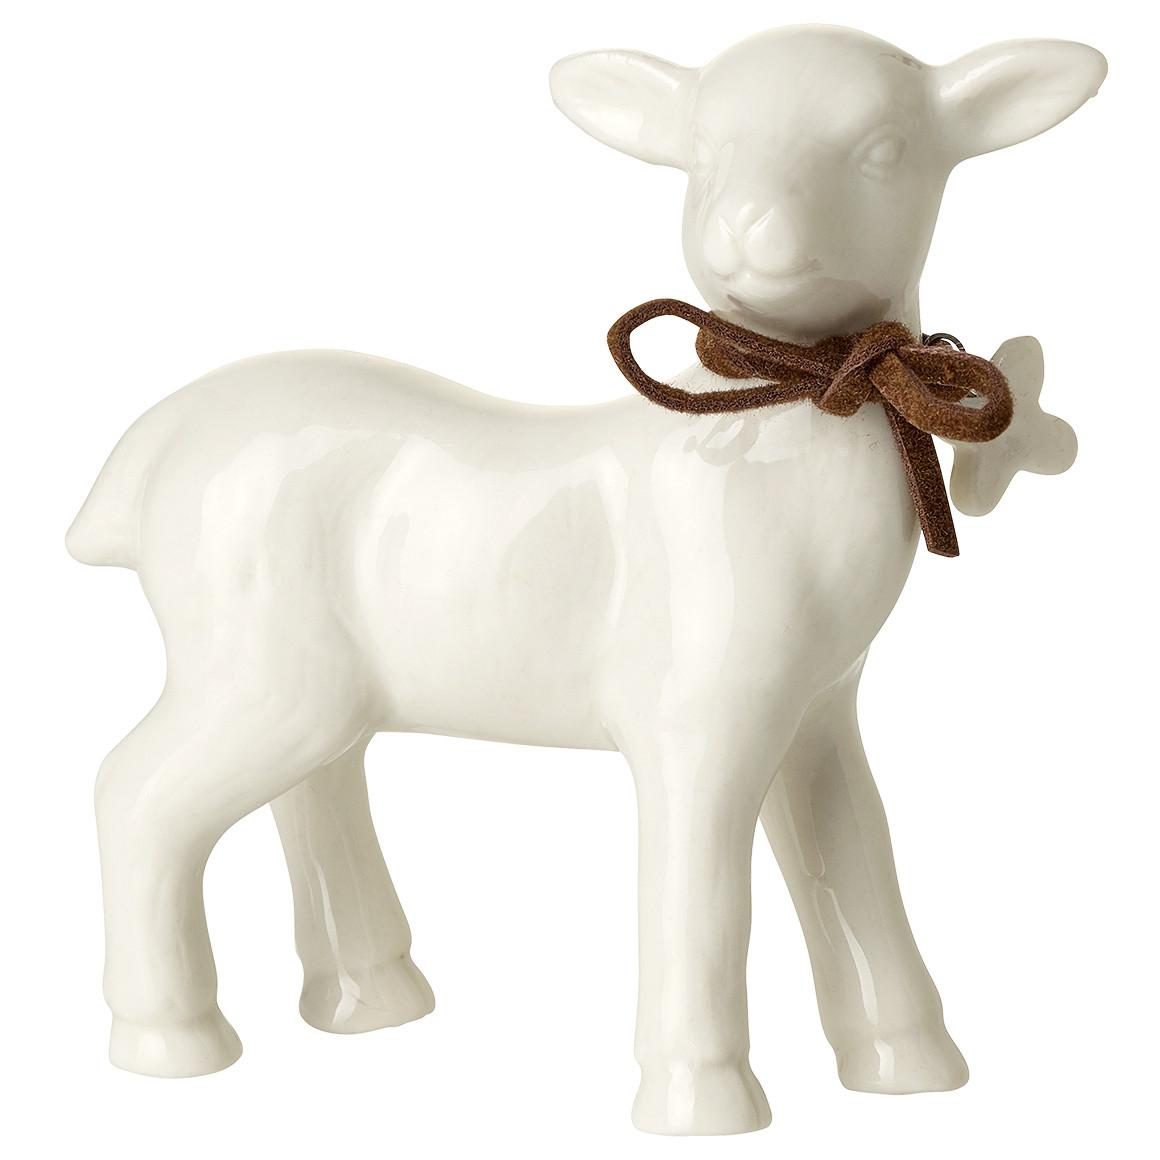 Deko Schaf aus Porzellan